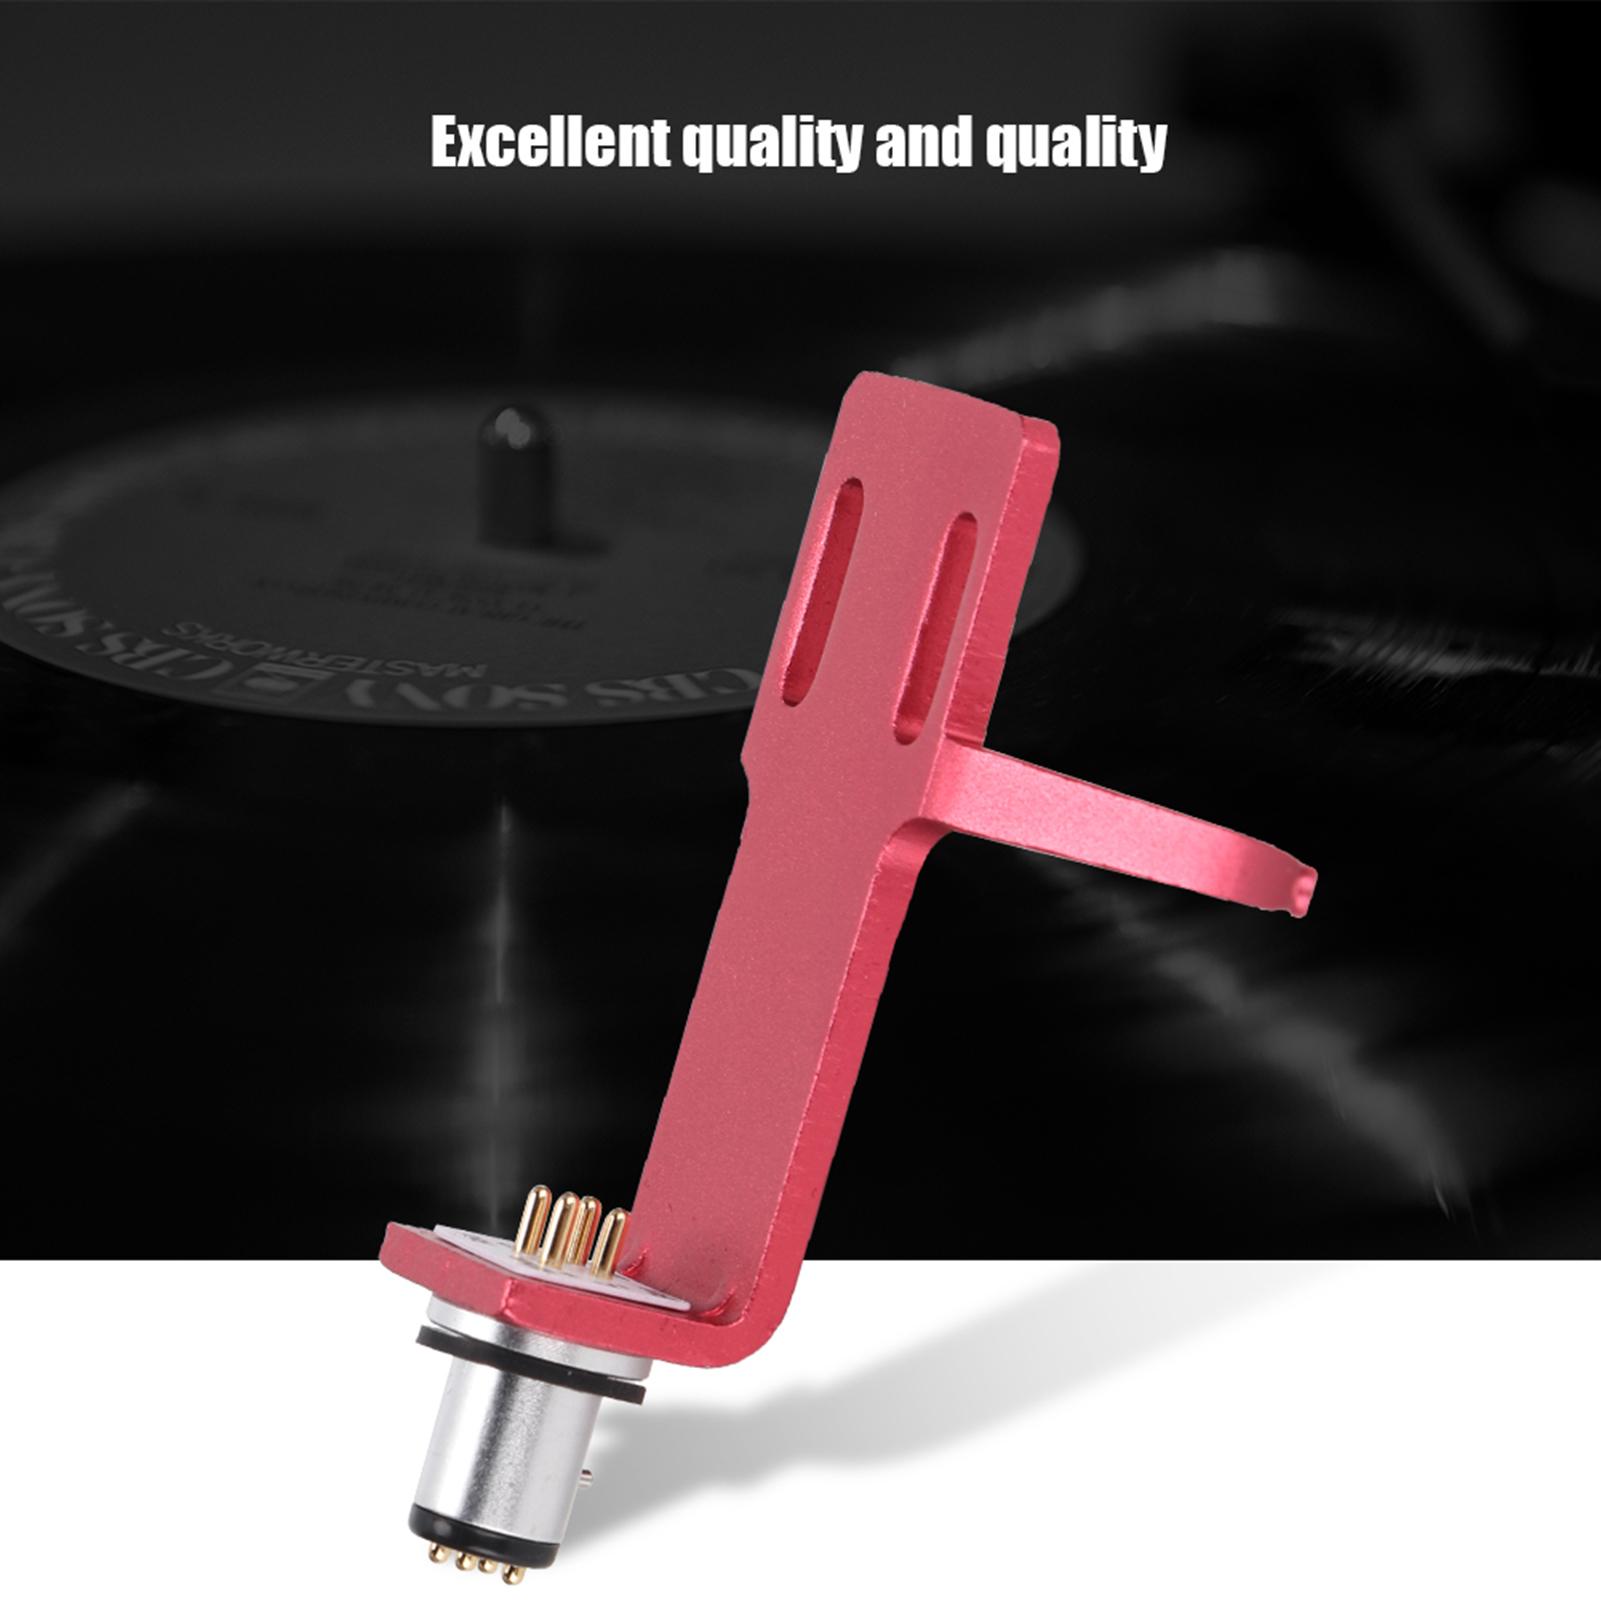 Universal-Phono-Stylus-Holder-Headshell-Cartridge-Keeper-for-LP-Record-Player thumbnail 15